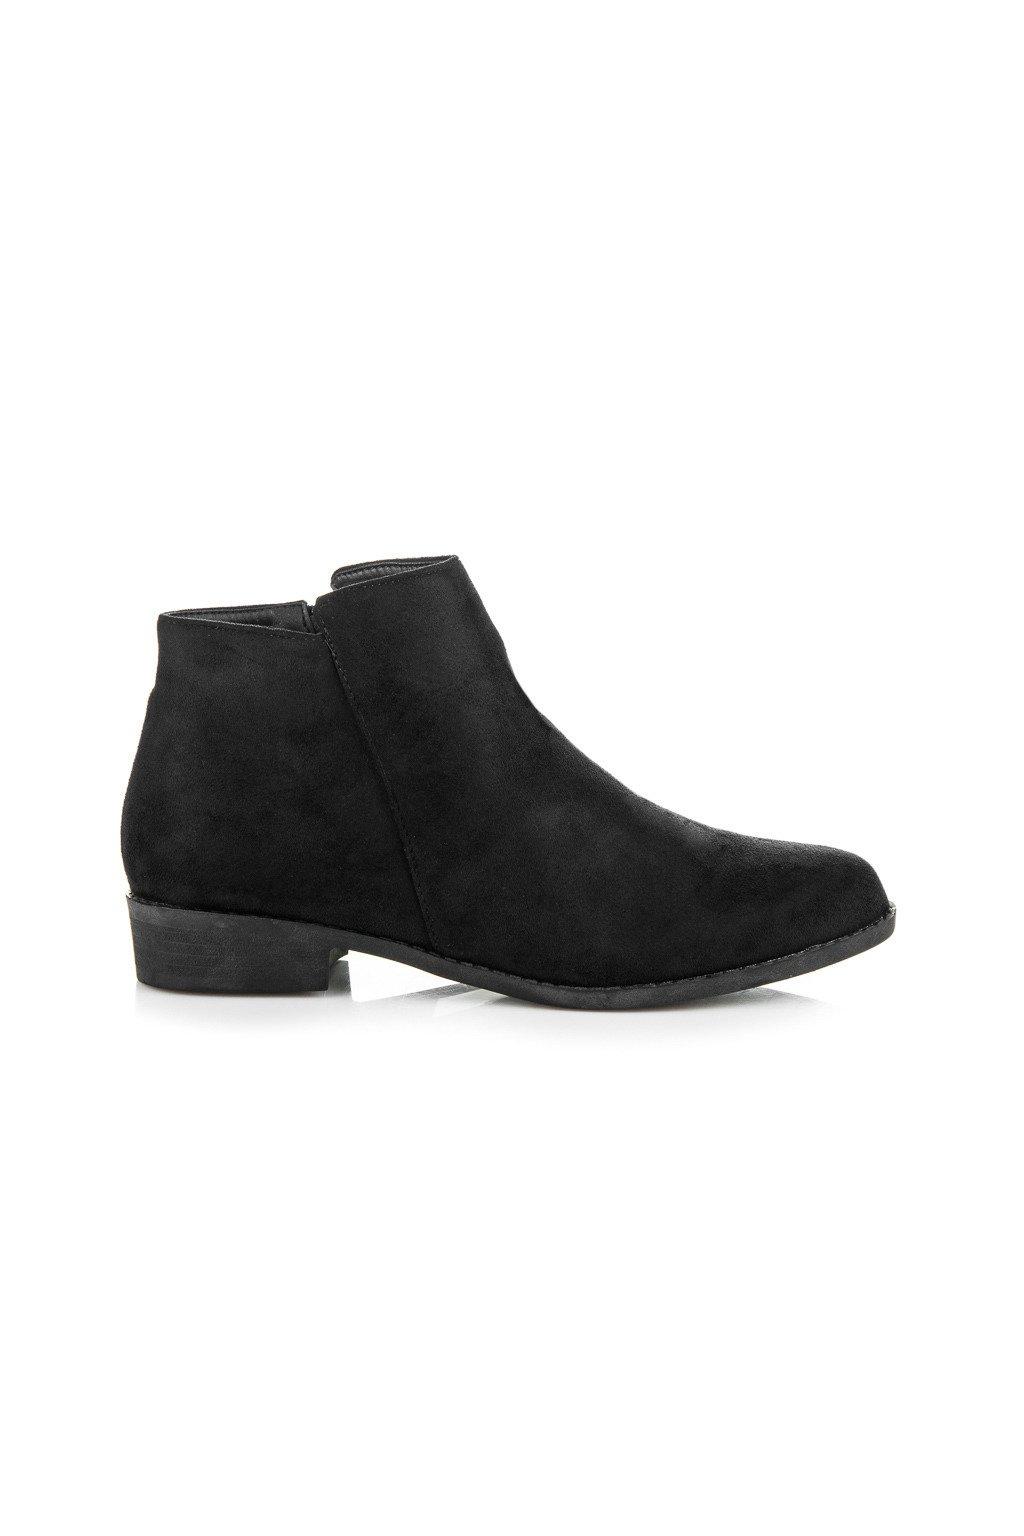 Dámske semišové topánky ql-53a-b veľ.č. 38 88caee4548c